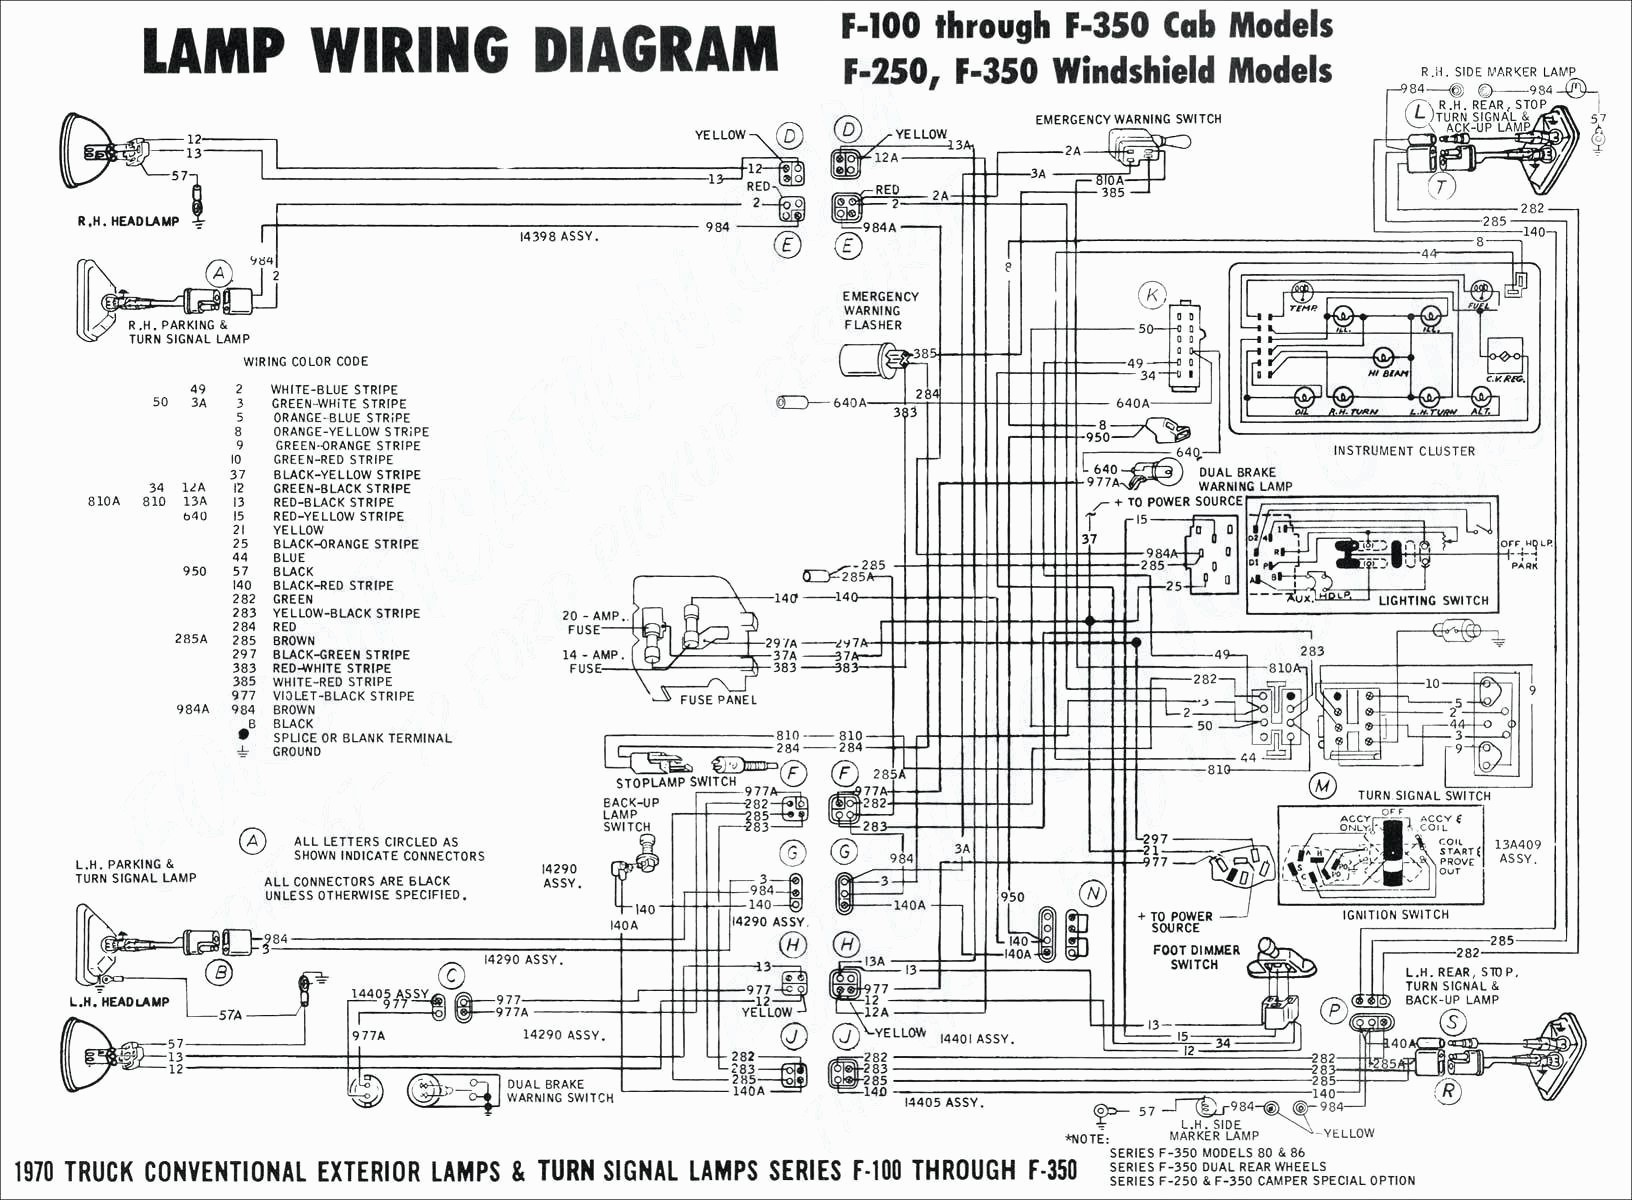 Toyota Corolla Engine Diagram 33 Elegant toyota Corolla 1987 S Of Toyota Corolla Engine Diagram